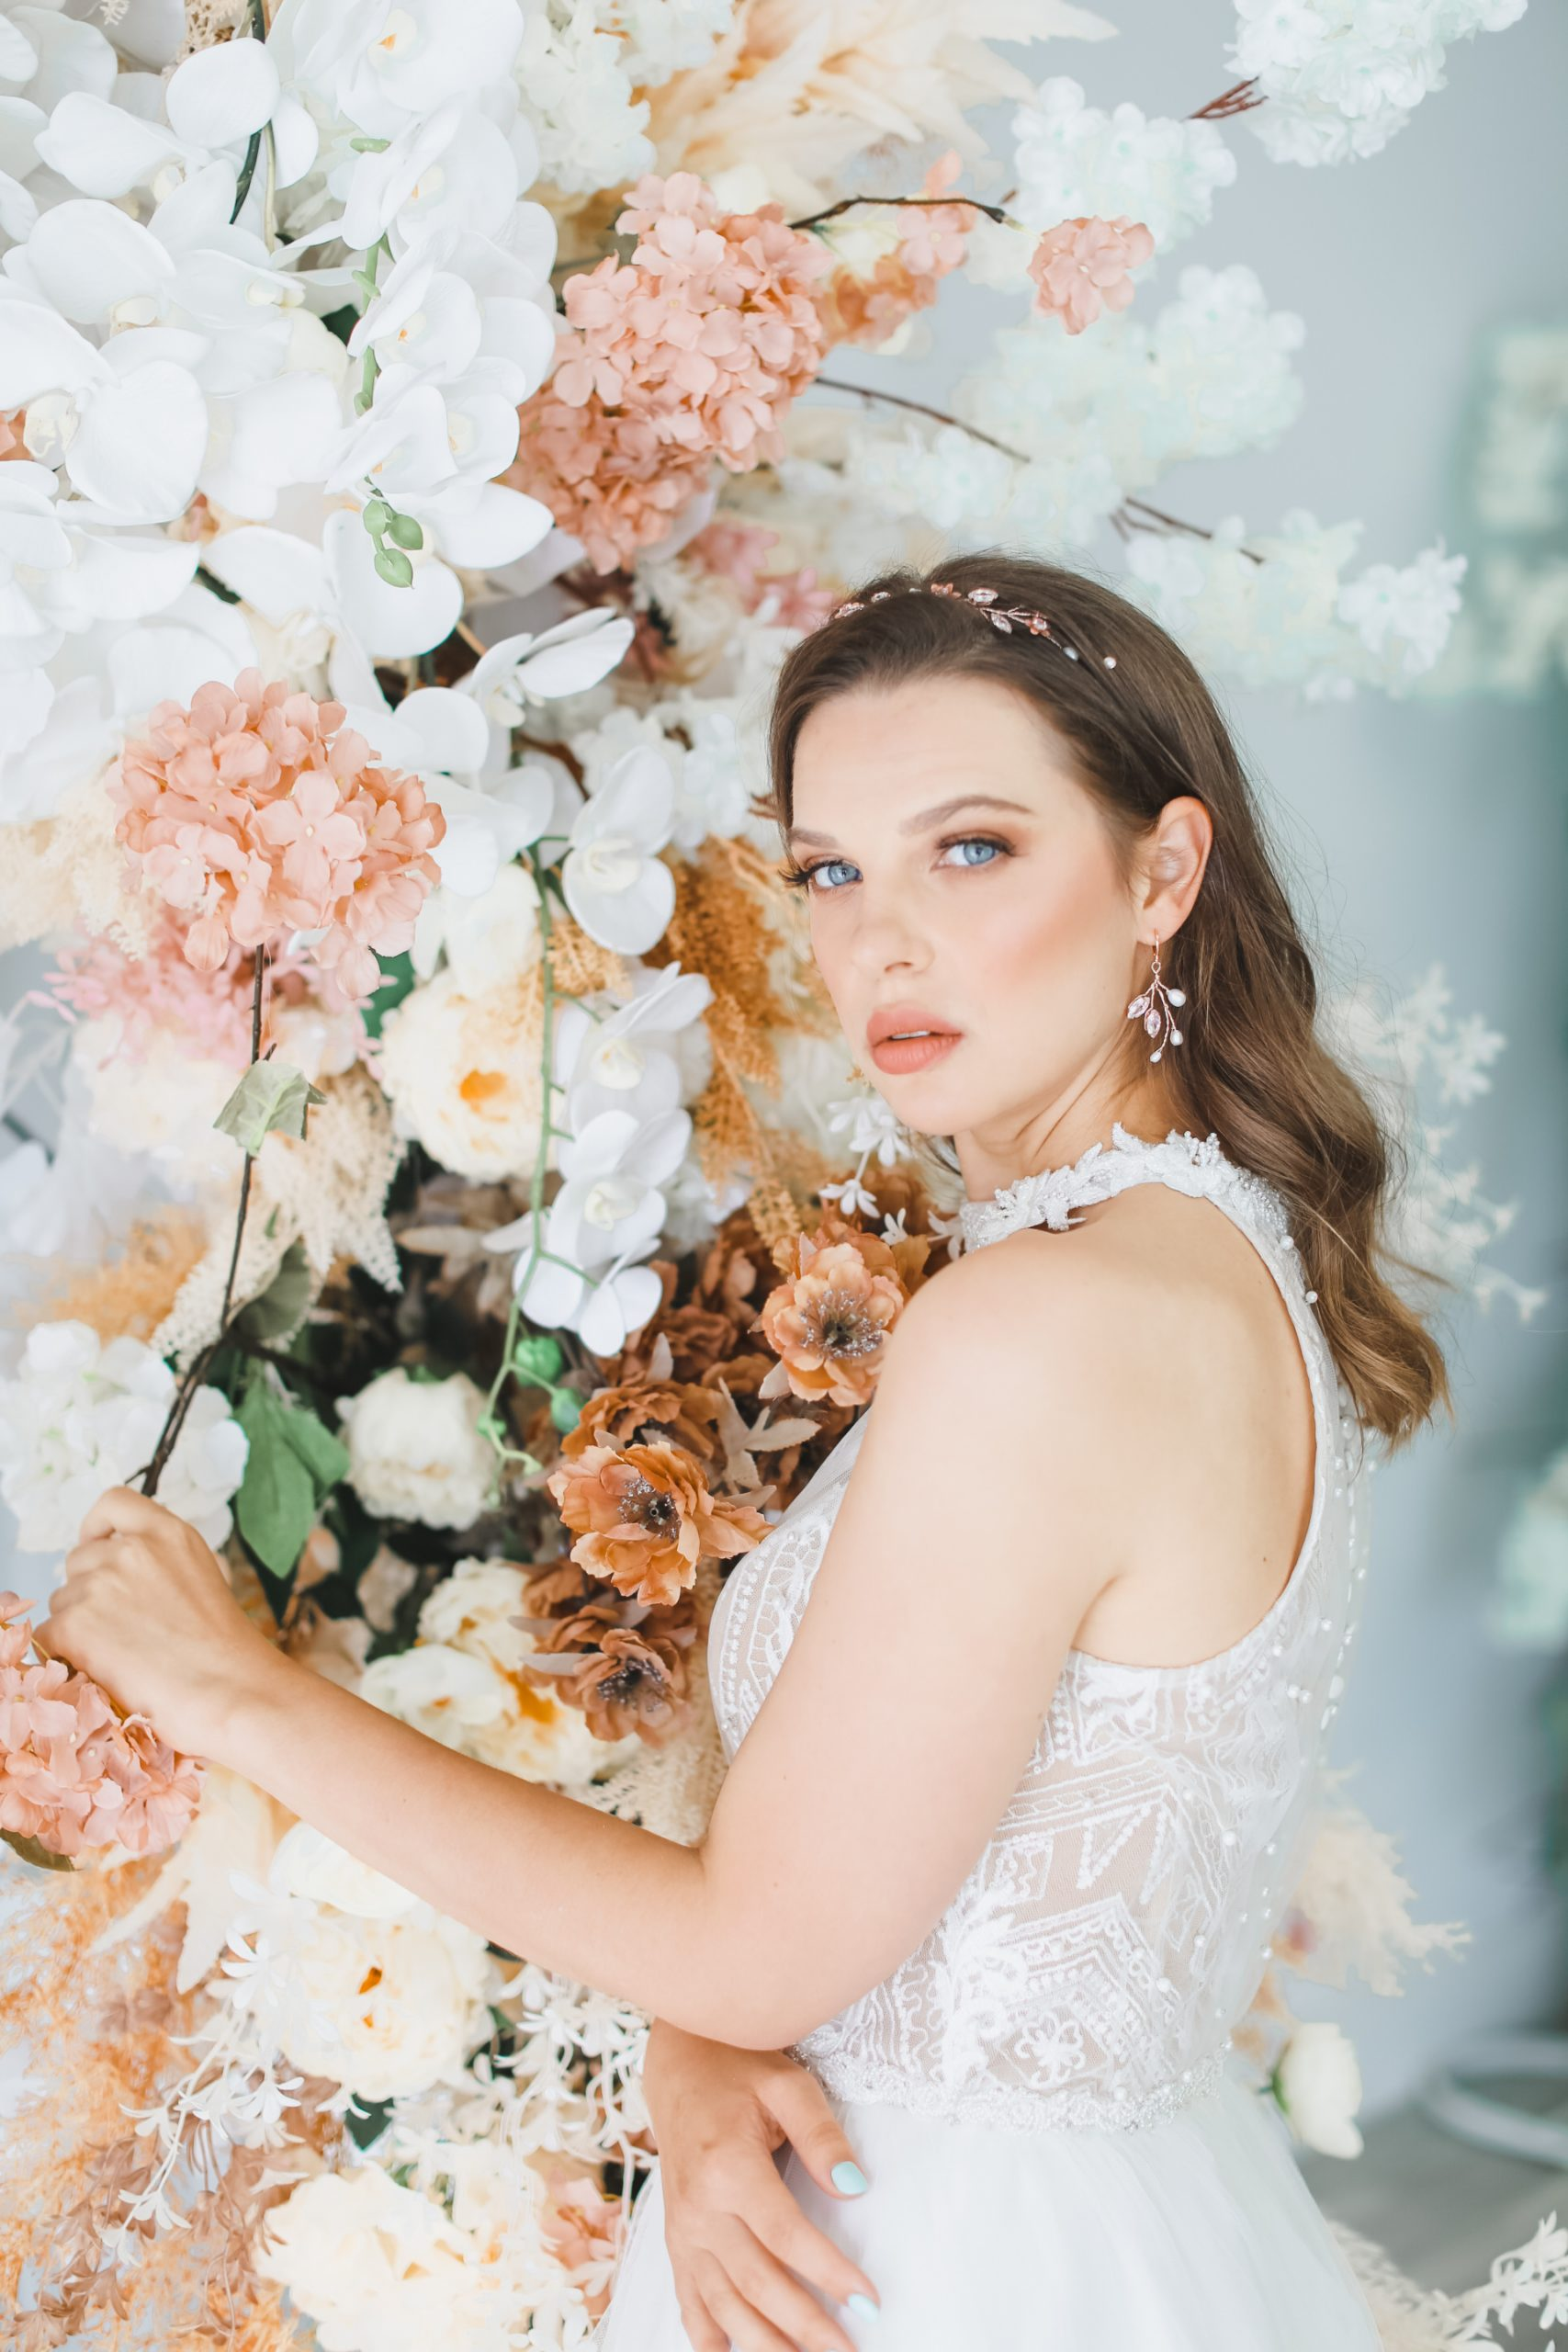 Toronto Bridal Makeup Services